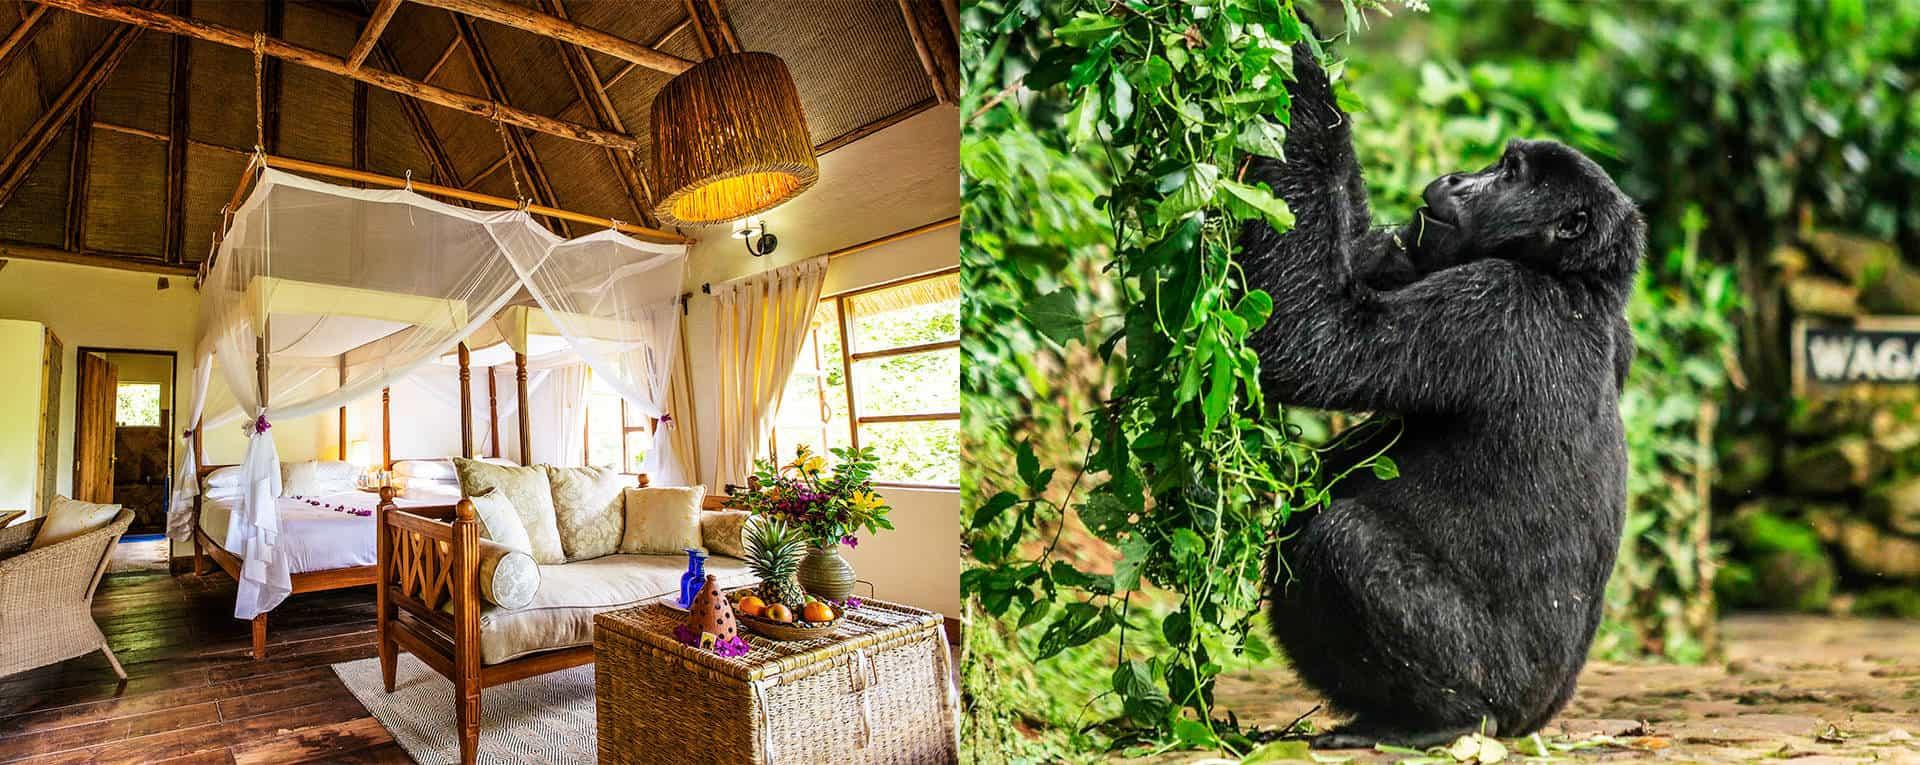 Exemplary Forest Stayovers For Gorilla & Chimpanzee Trekking Safaris